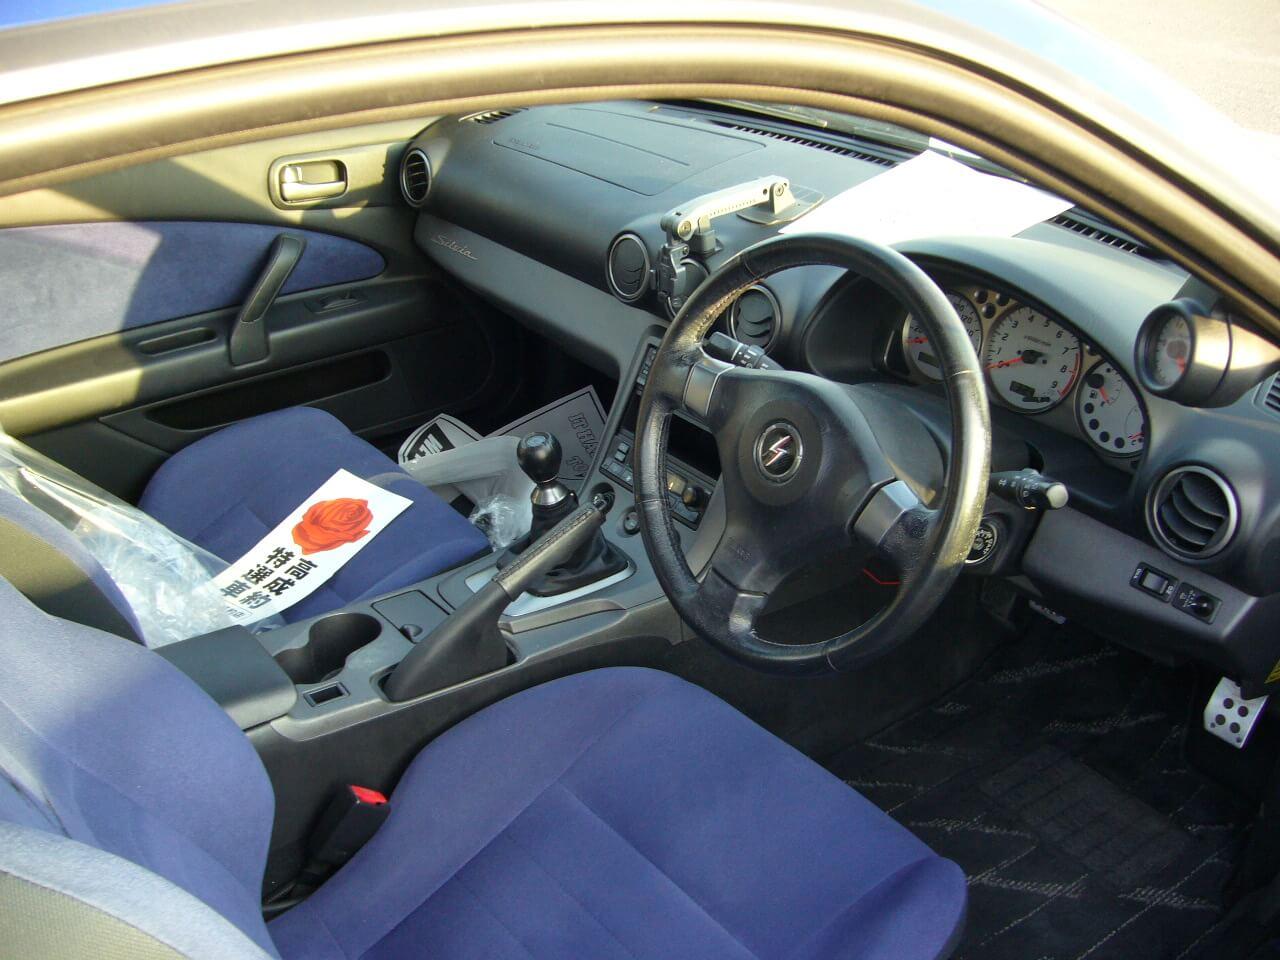 Nissan Silvia S15 Spec-R Blau Cockpit Jp-Importcars